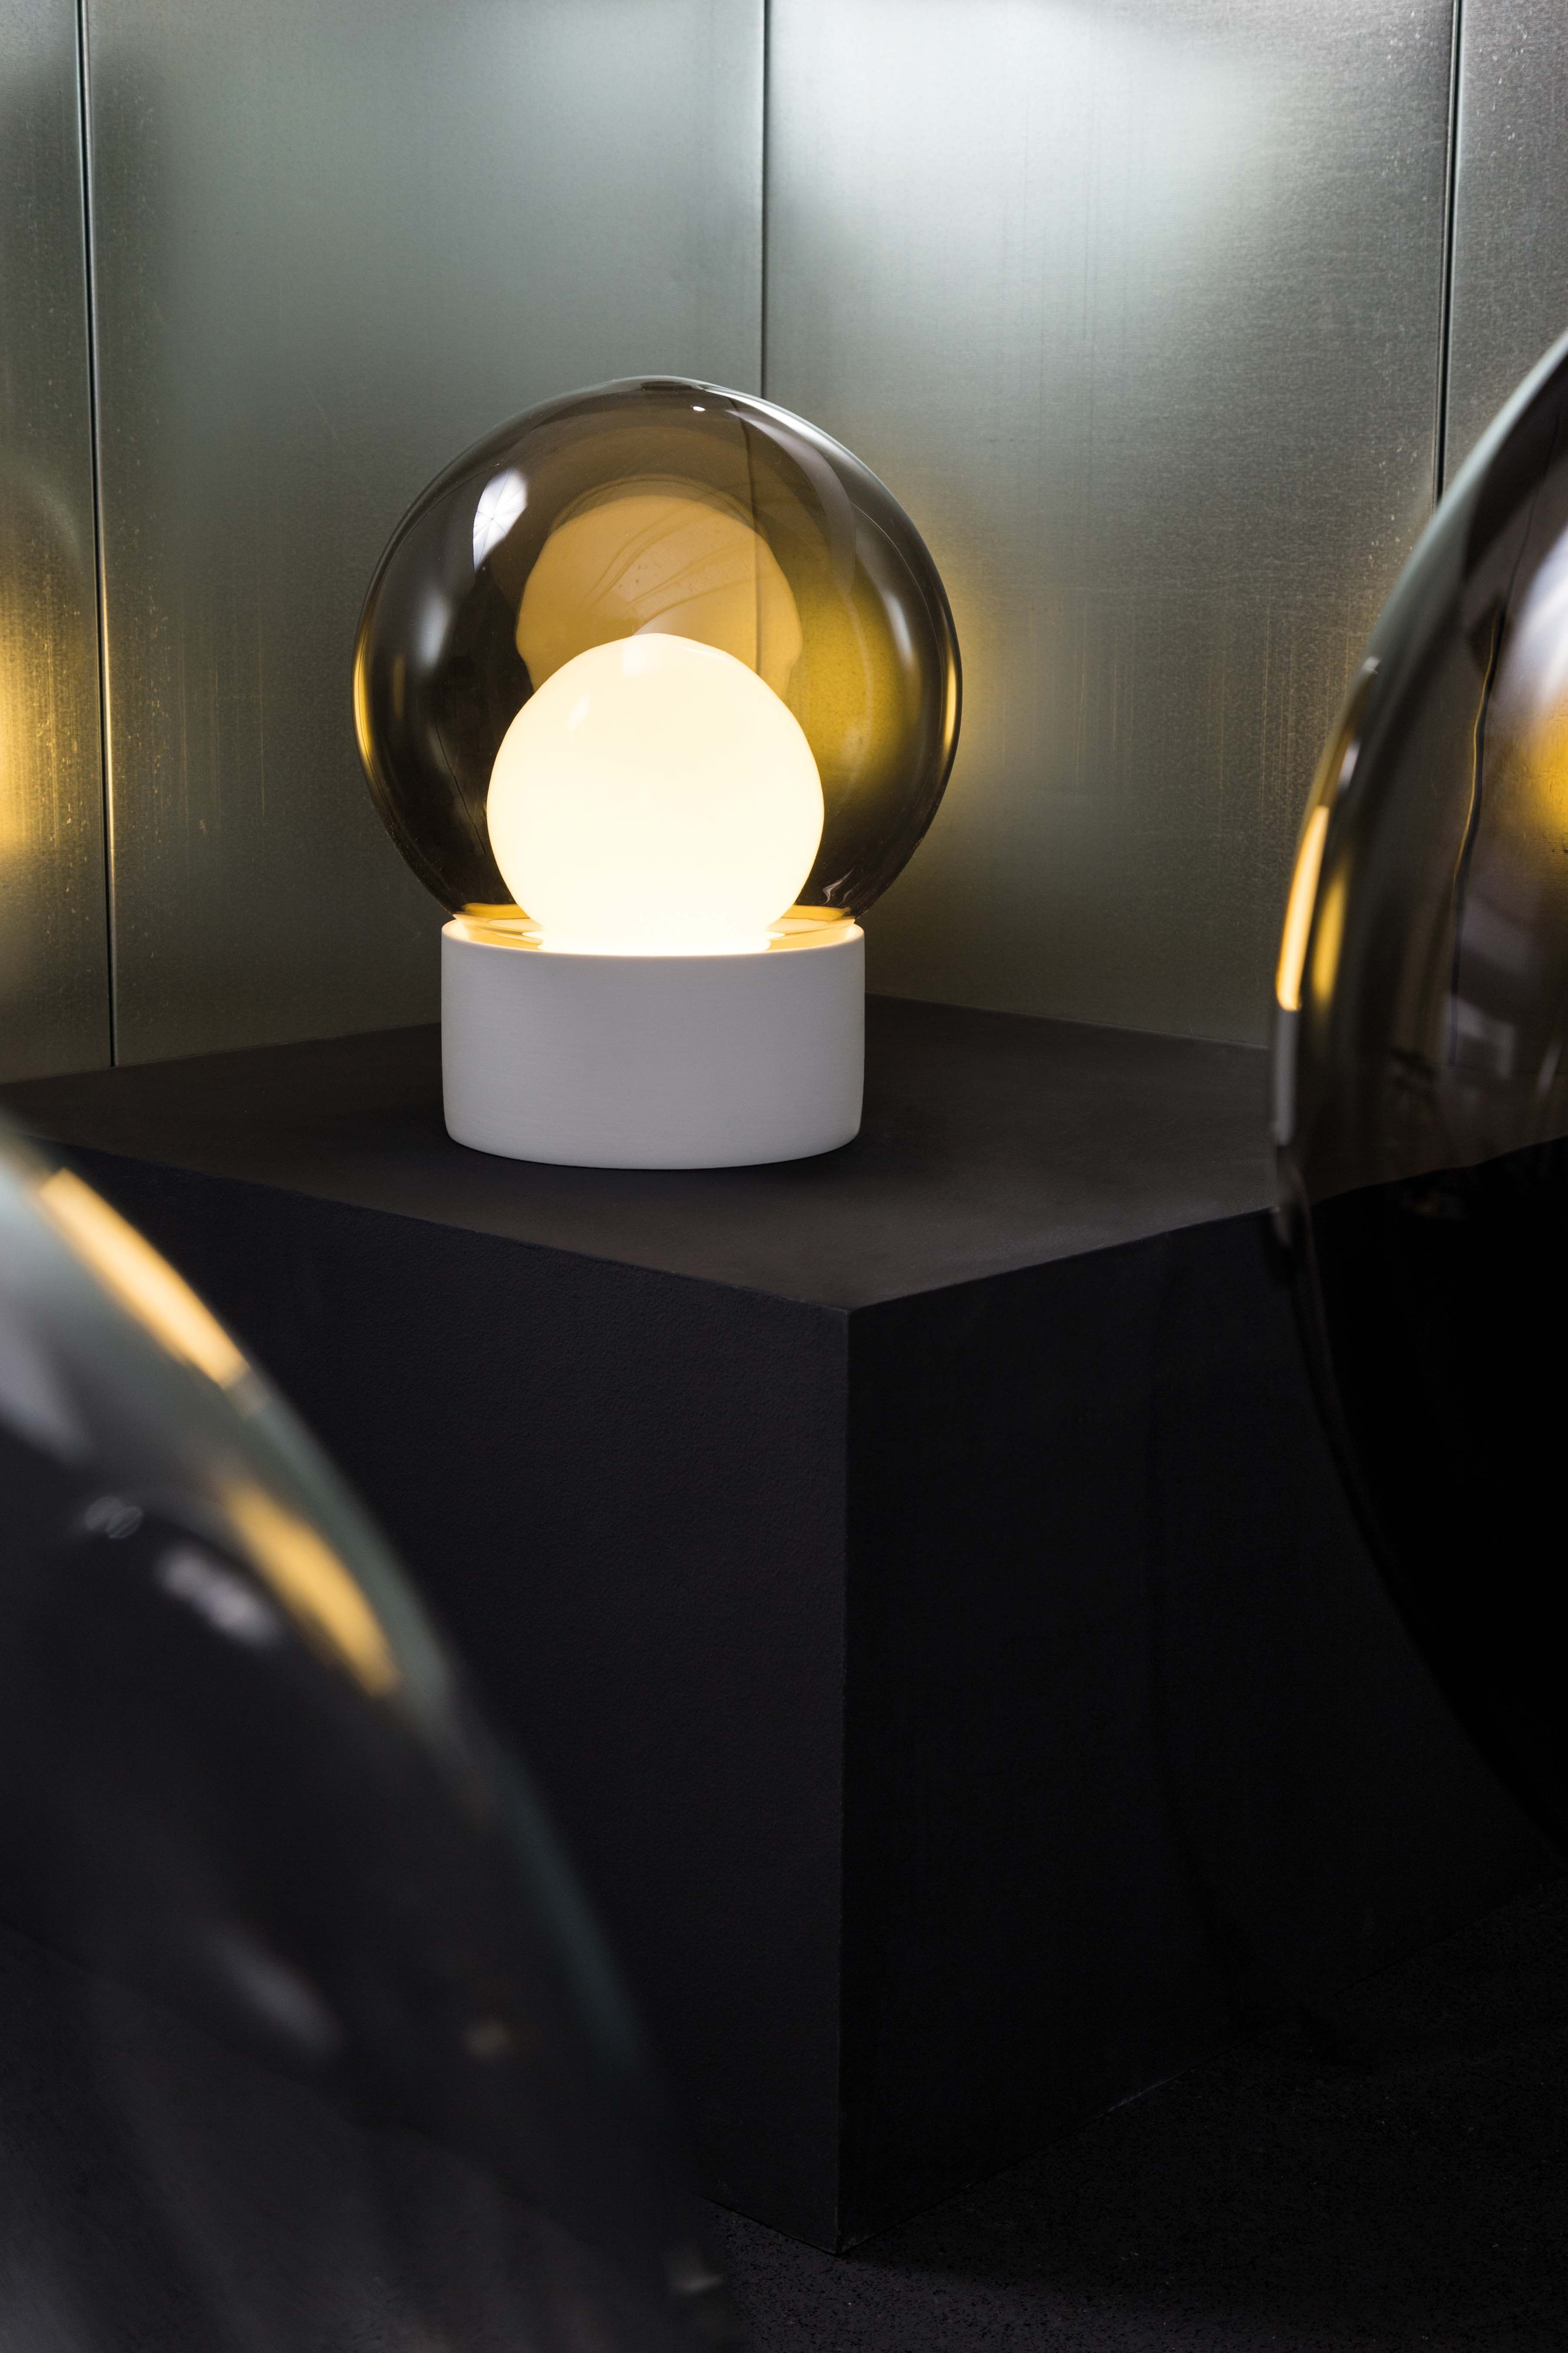 Boule By Sebastian Herkner Lamp Material Glass And Porcelain Pulpo Www Pulpoproducts Com Design Milk Light Lamp